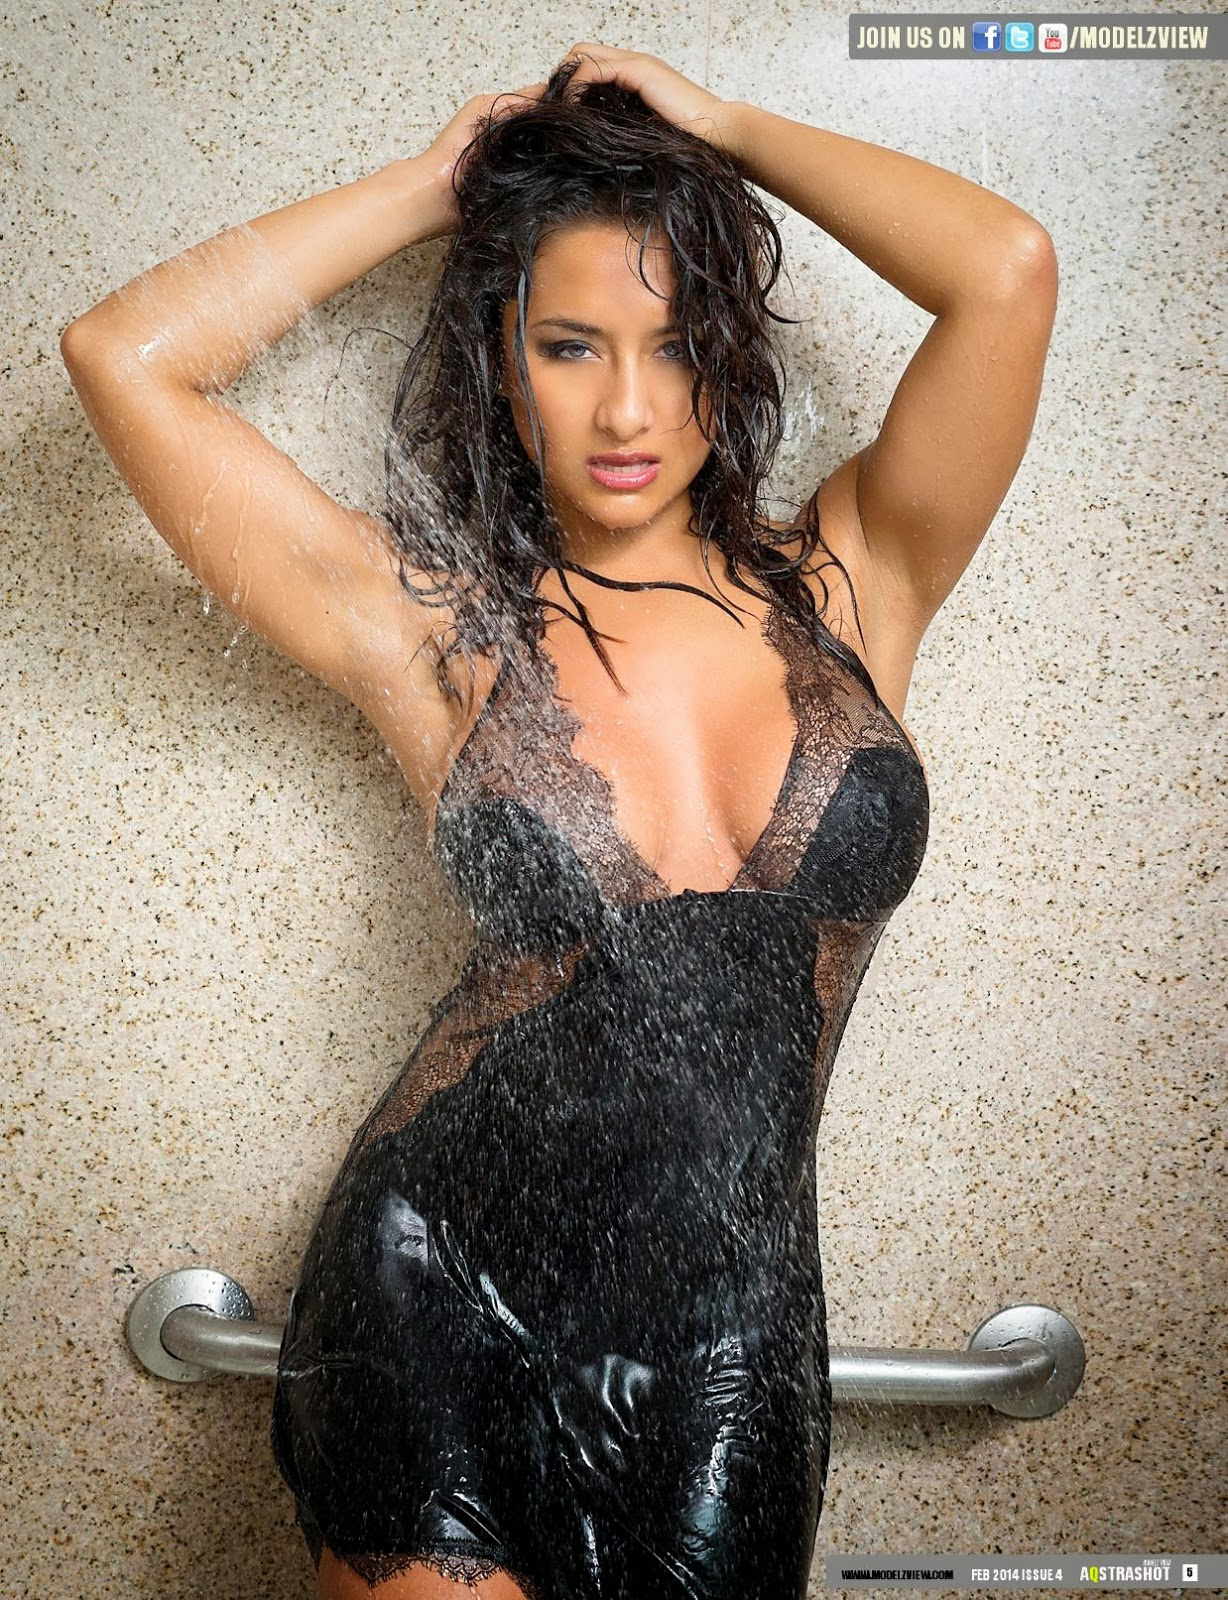 Nikki Rae HQ Pictures Aqstrashot Magazine Photoshoot February 2014